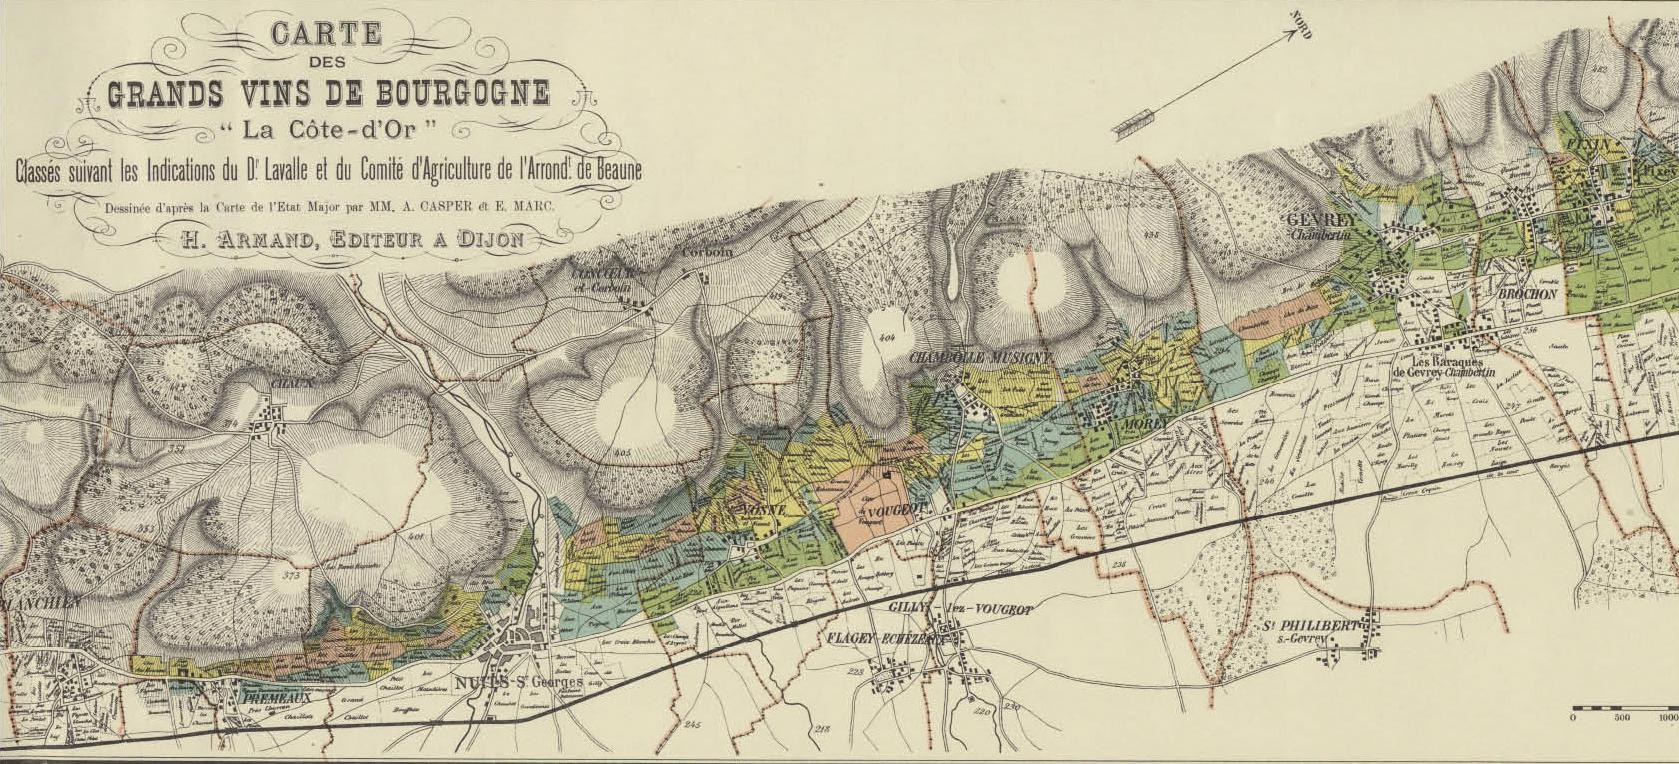 Carte des Grands vins de Bourgogne